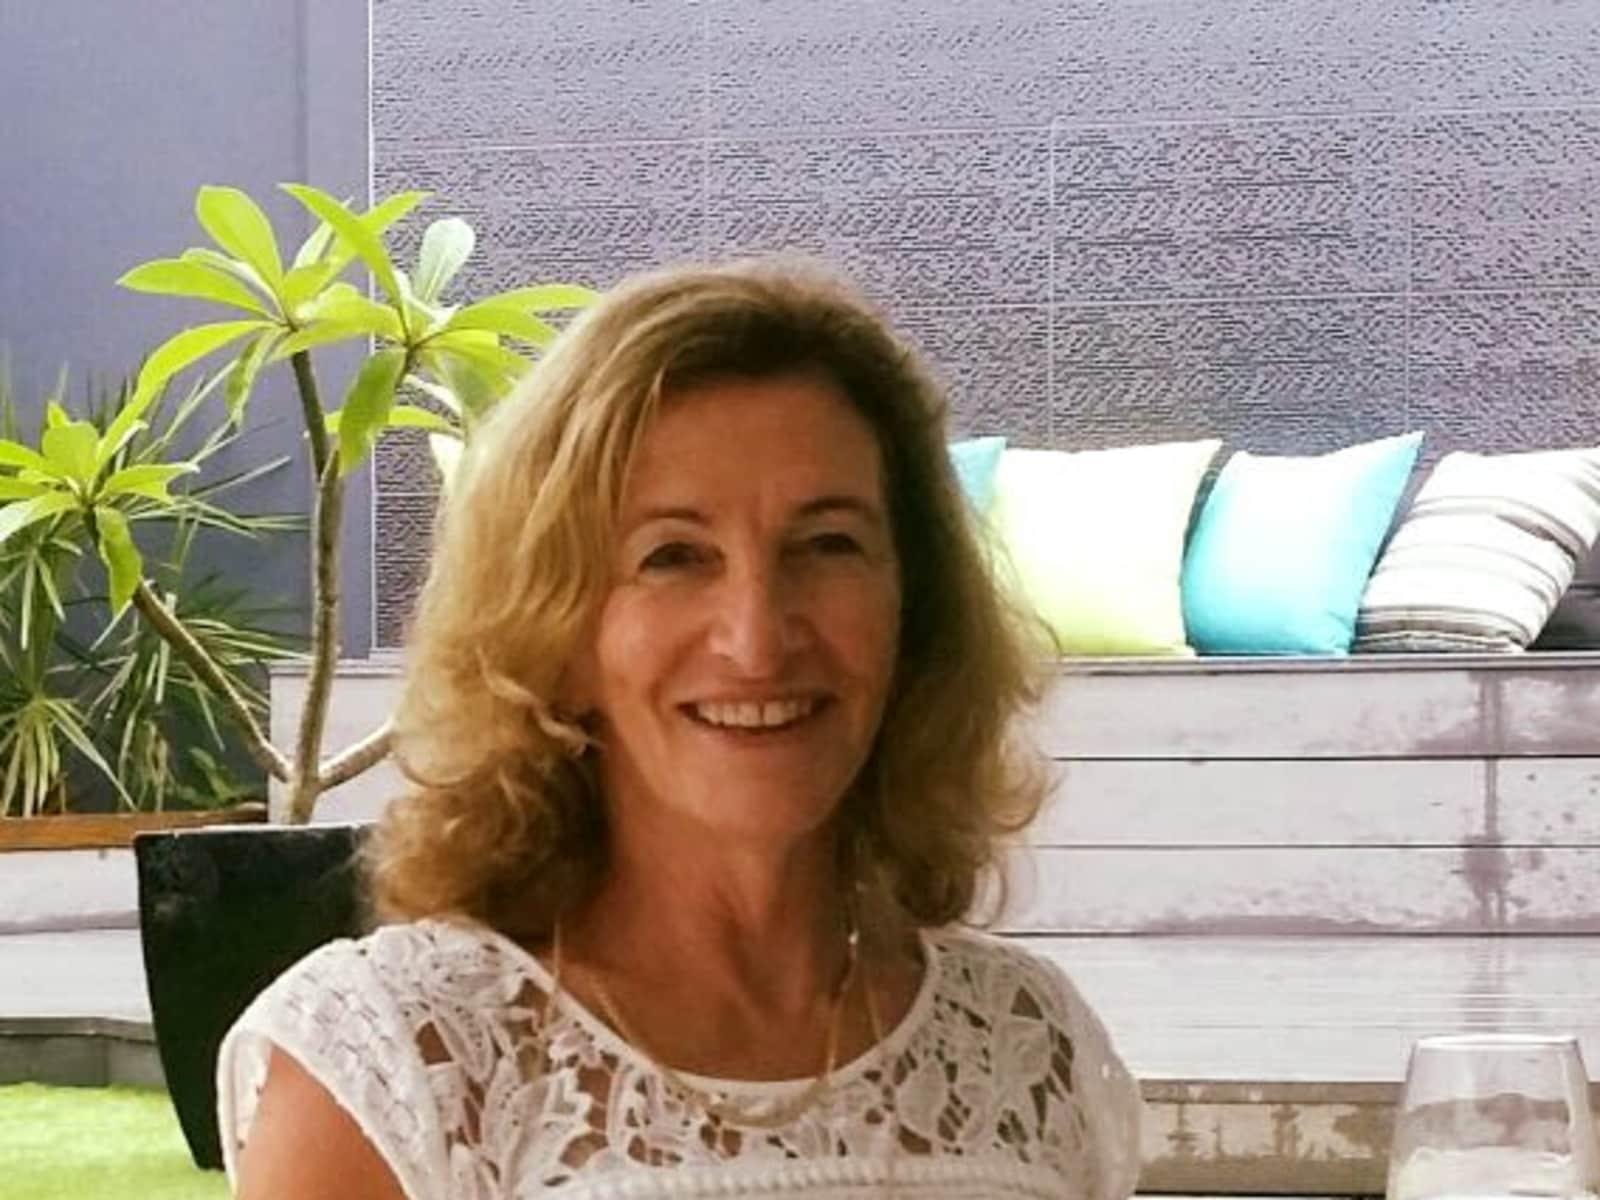 Vicki from Bateau Bay, New South Wales, Australia